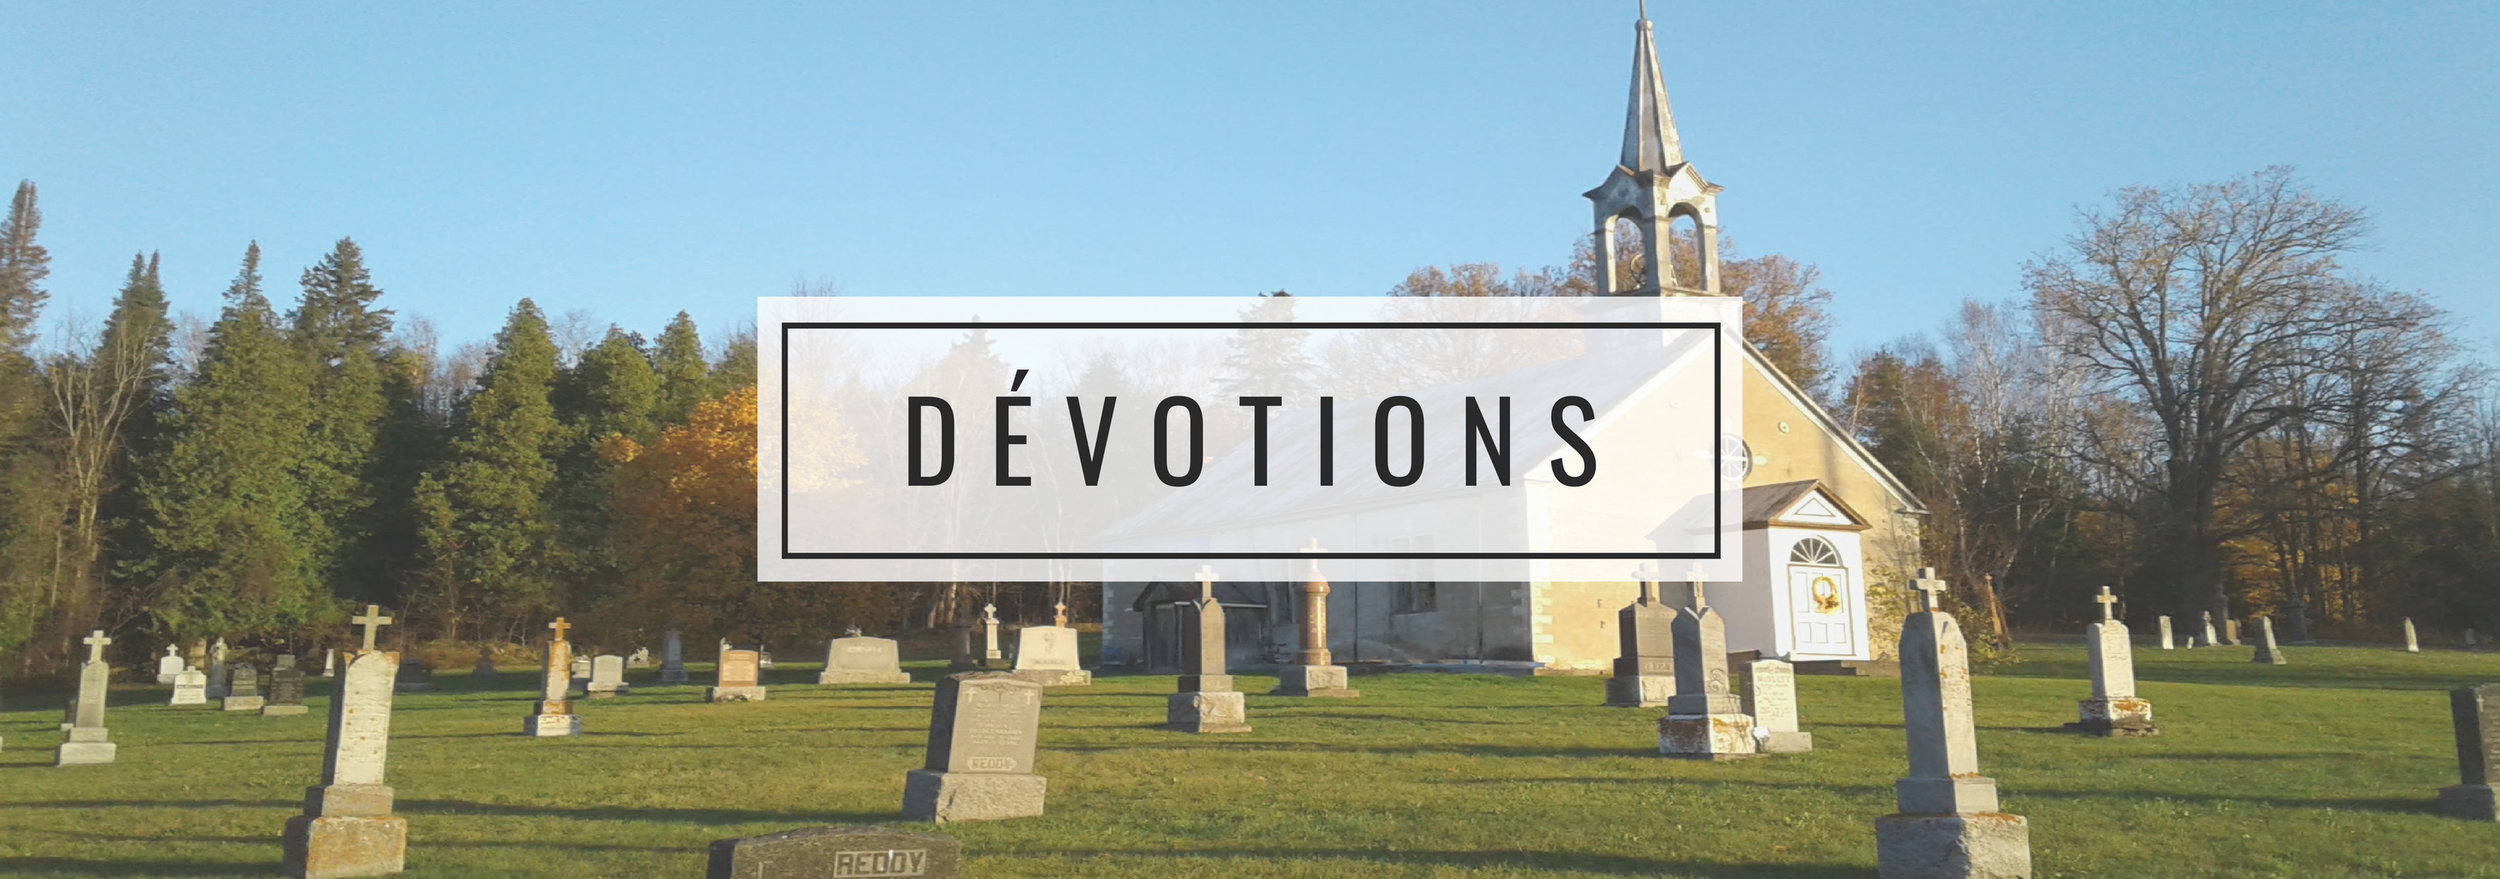 Dévotions graphic.jpg